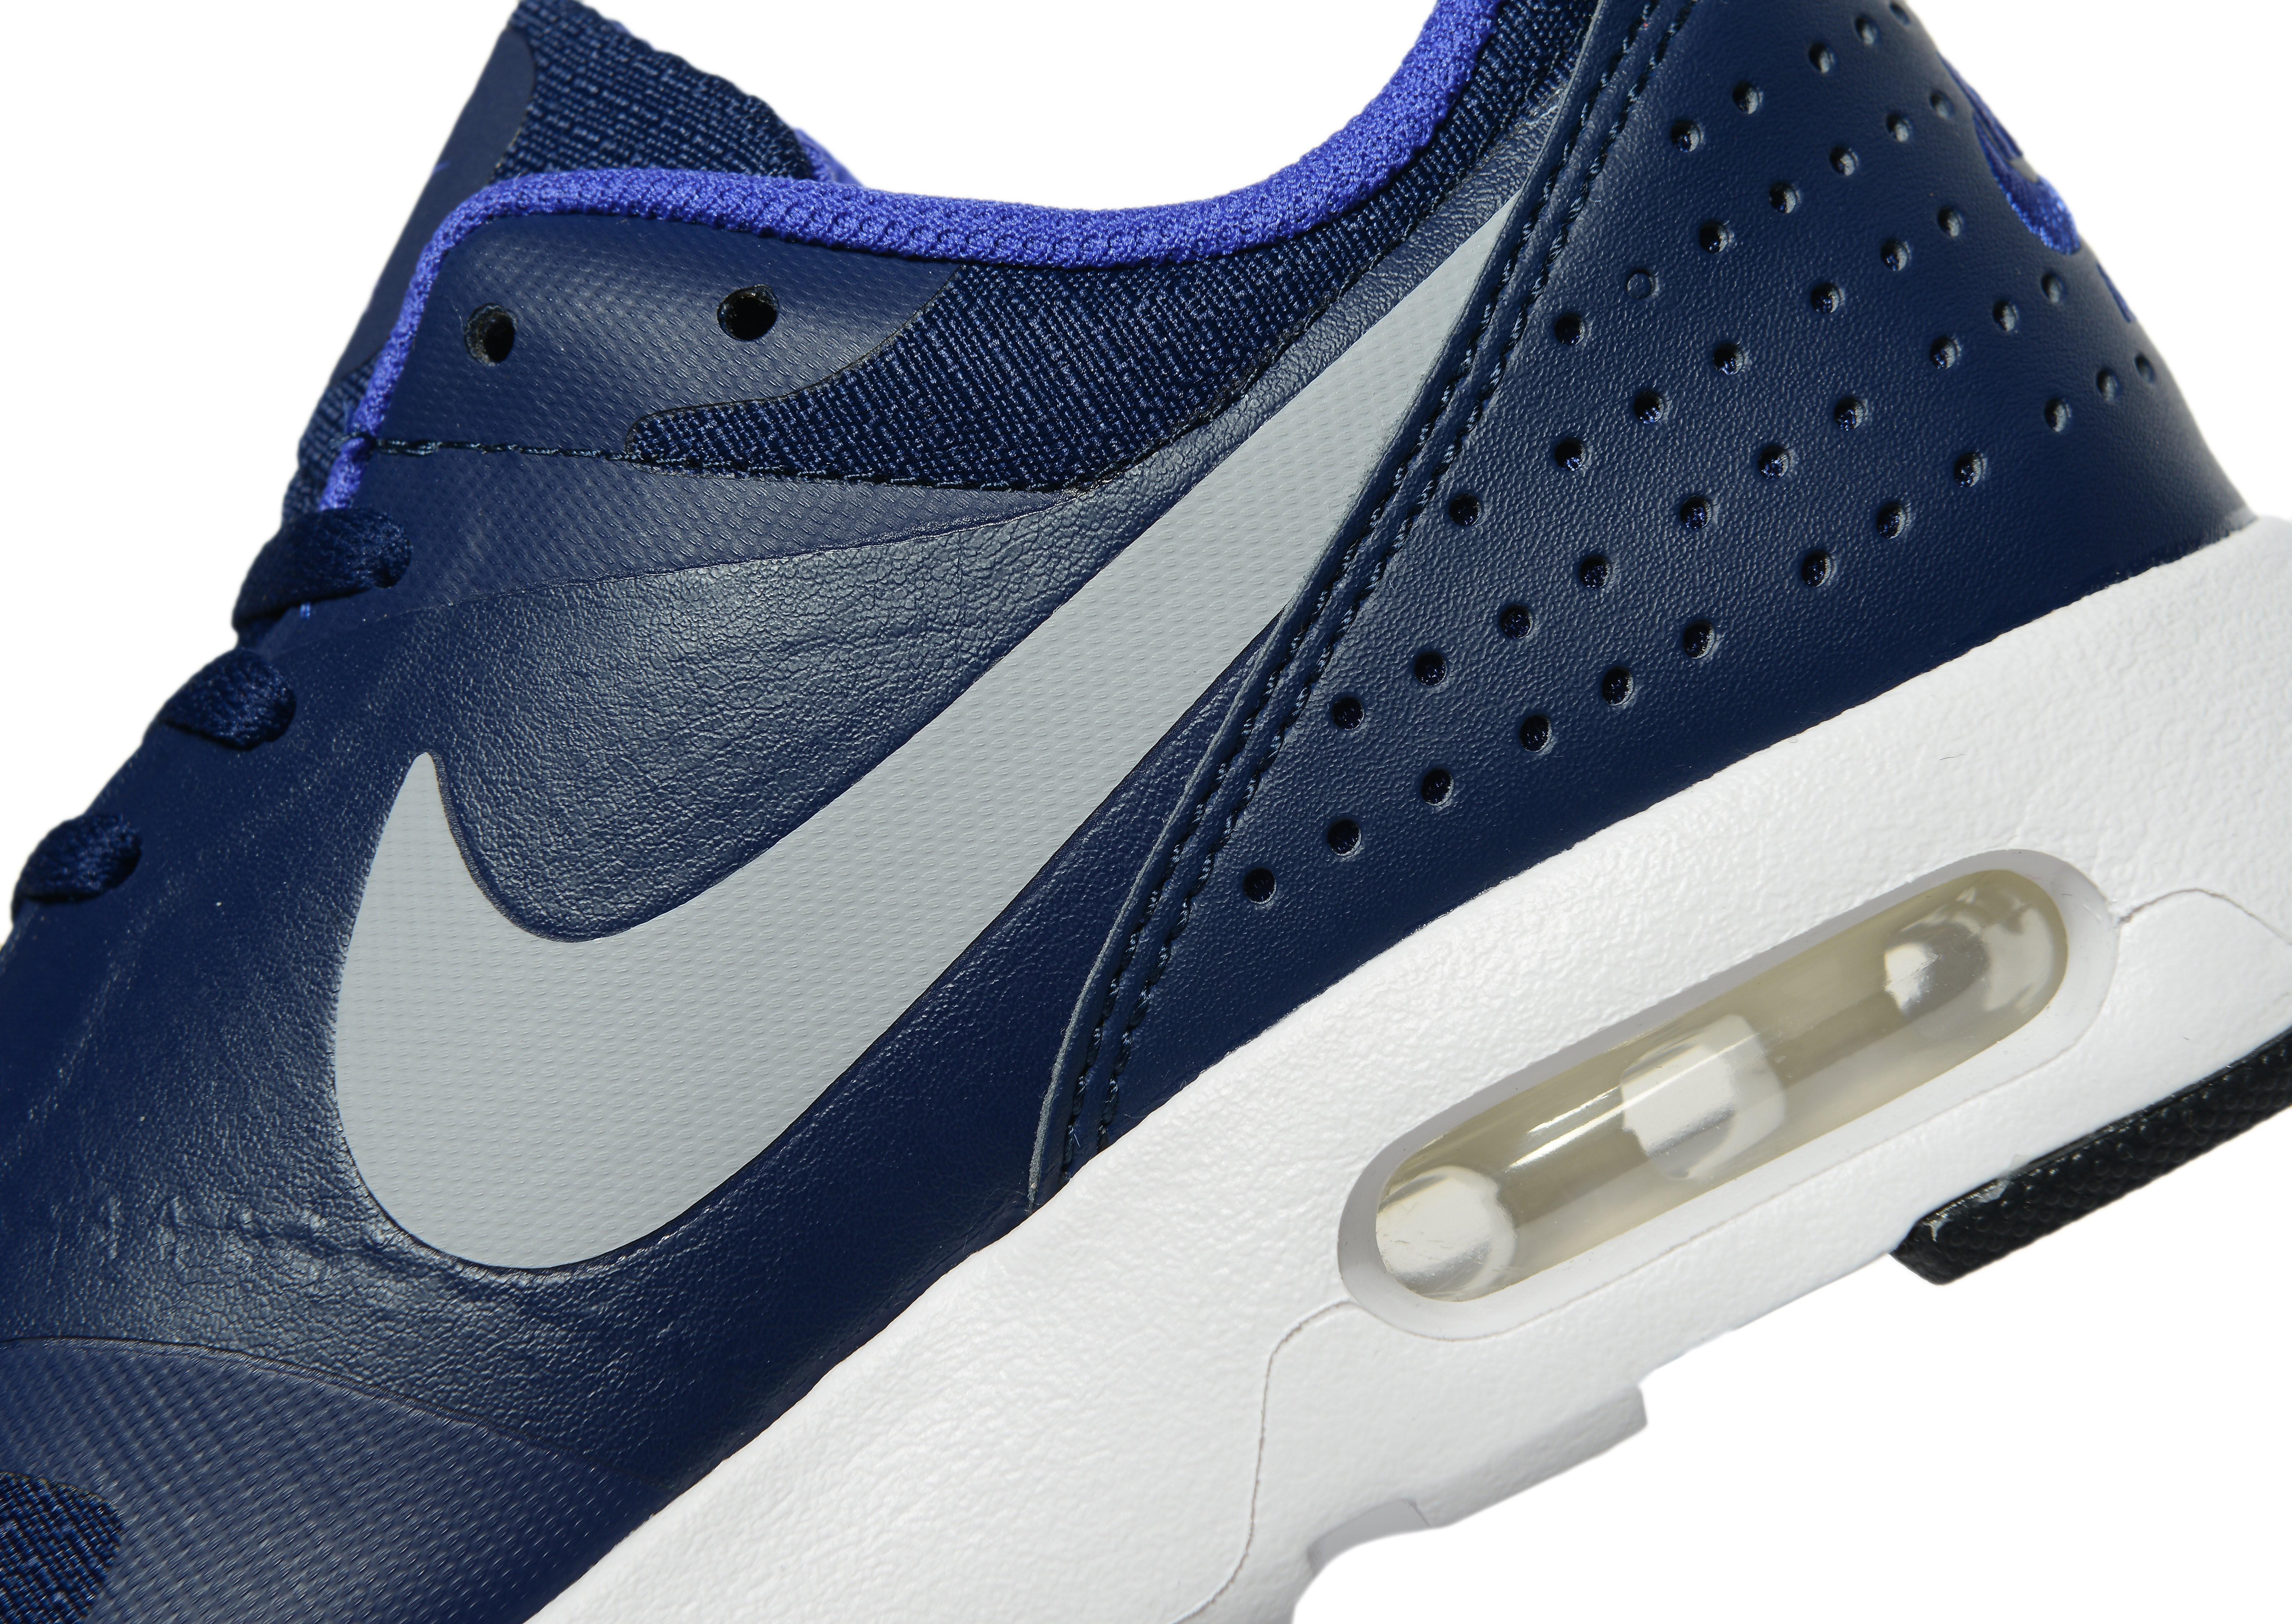 Nike Air Max Tavas per ragazzi